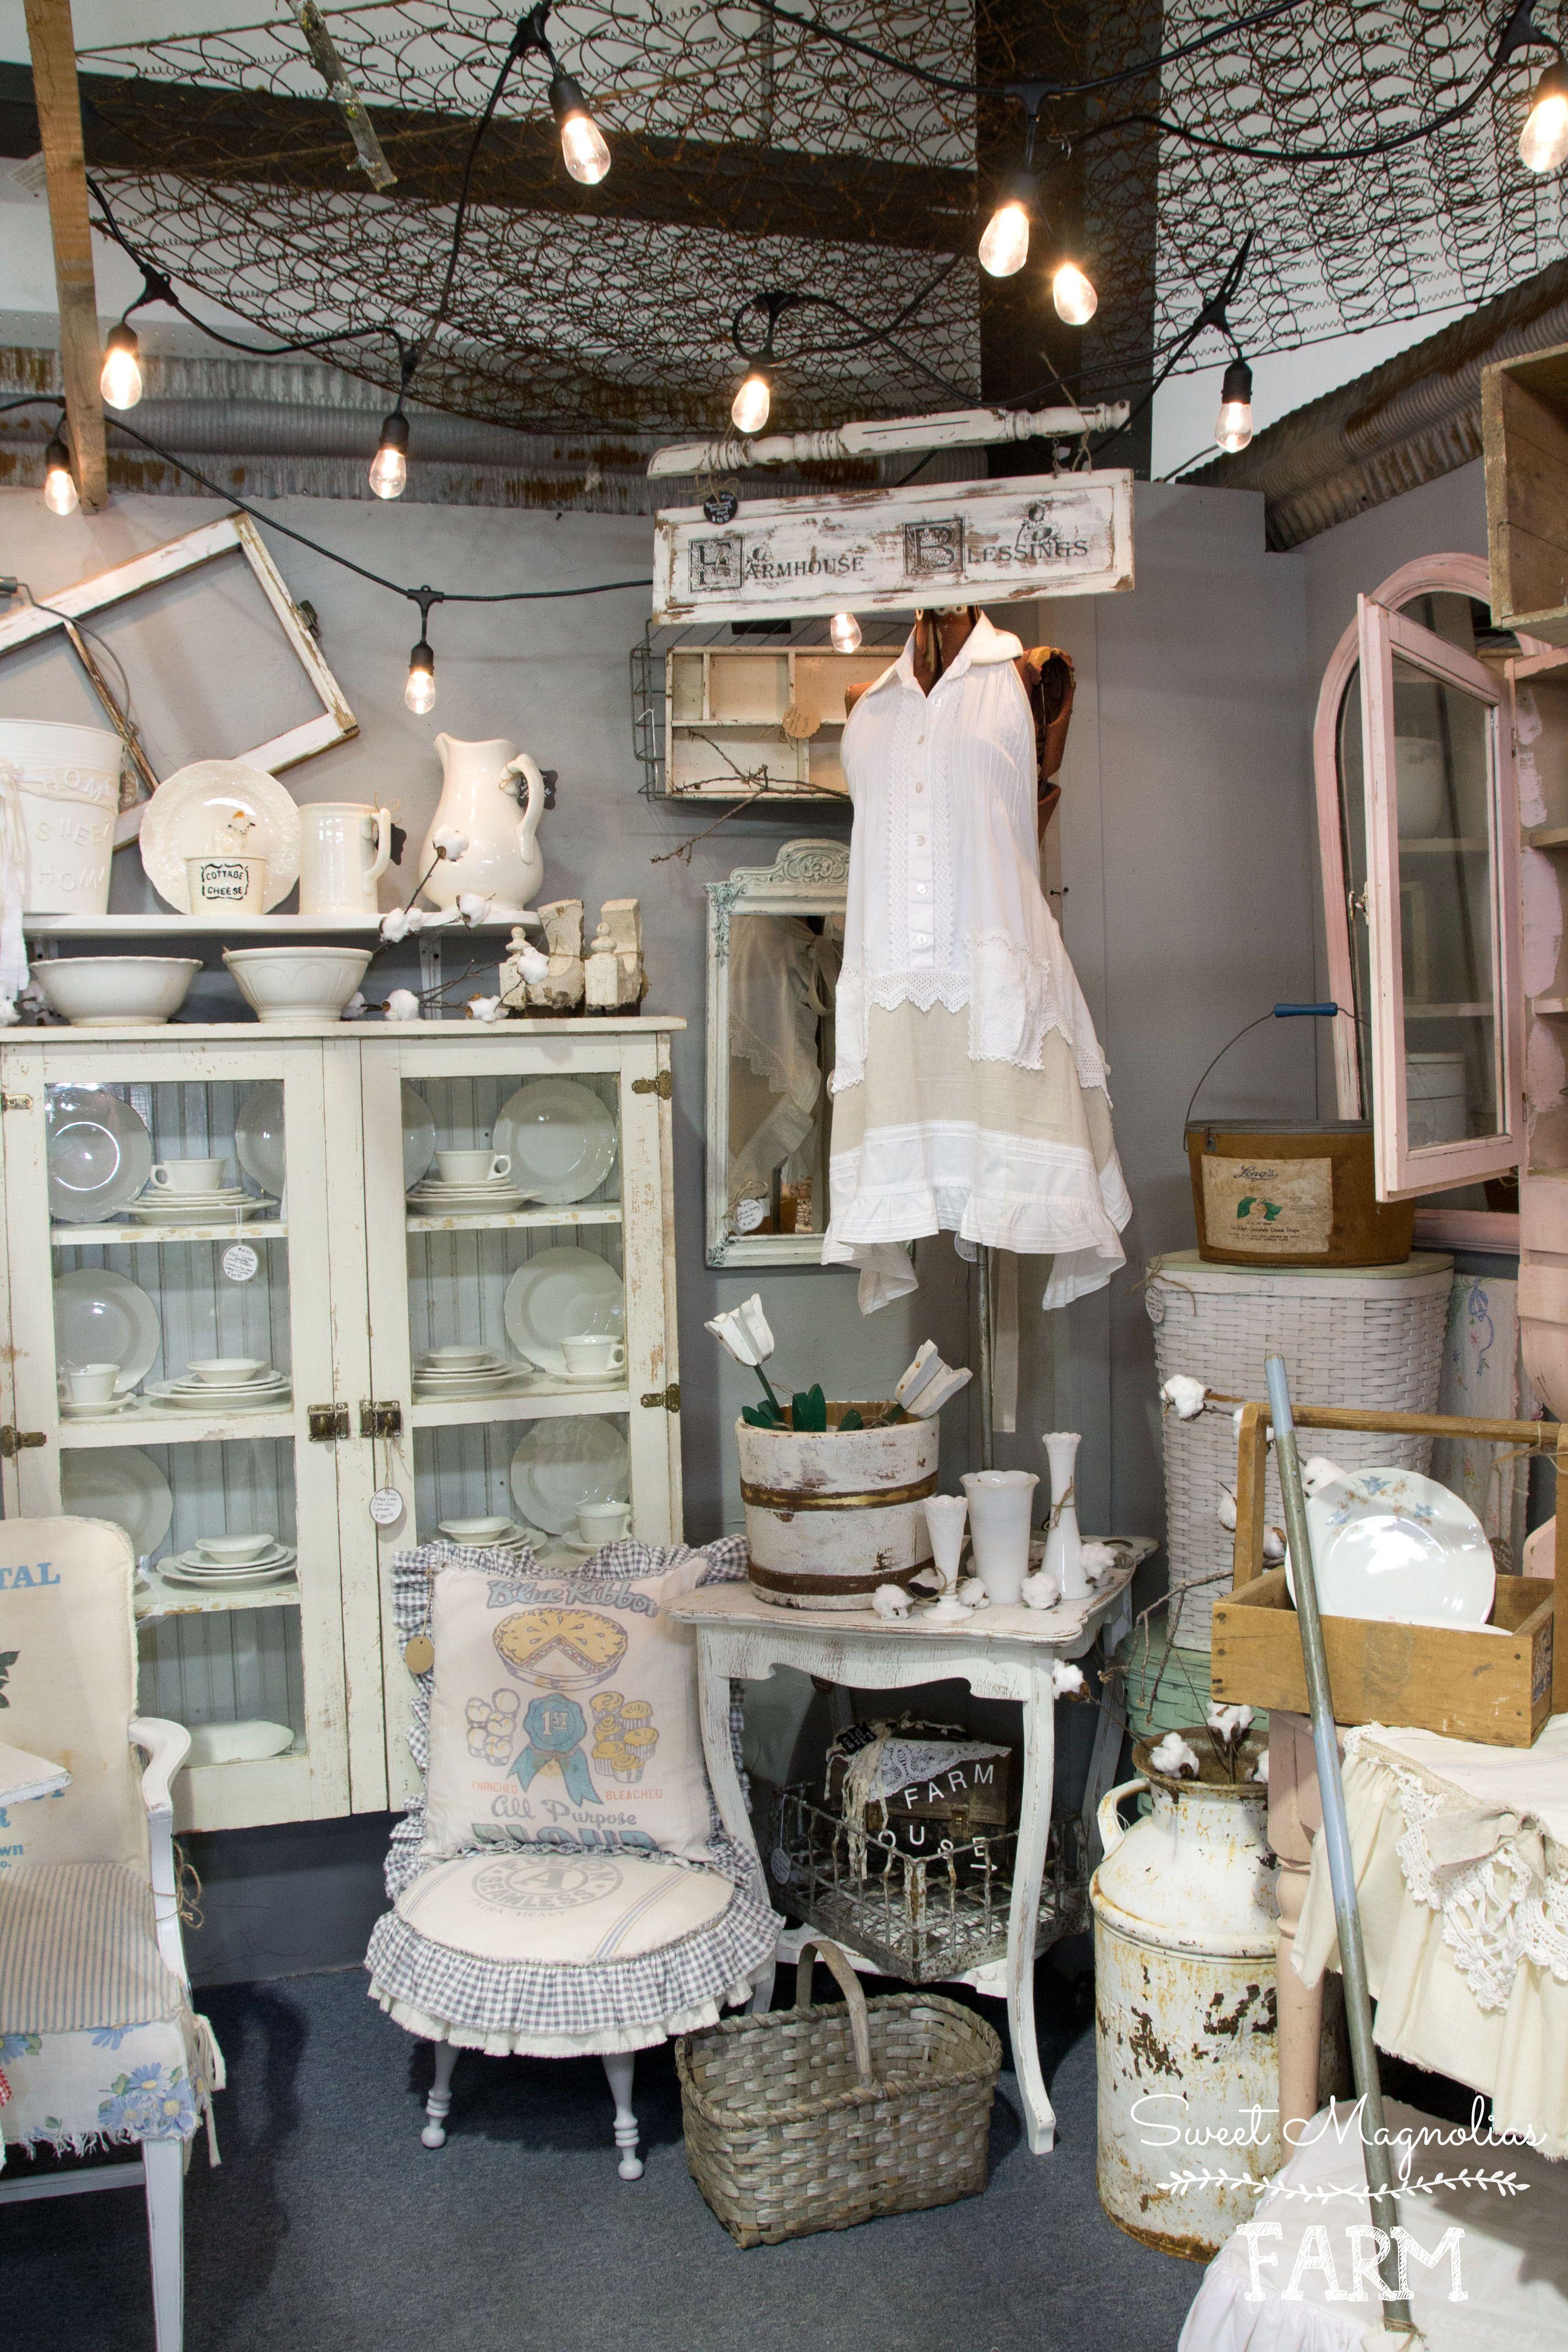 Sweet magnolias farm shop display camp flea antique mall ozark mo